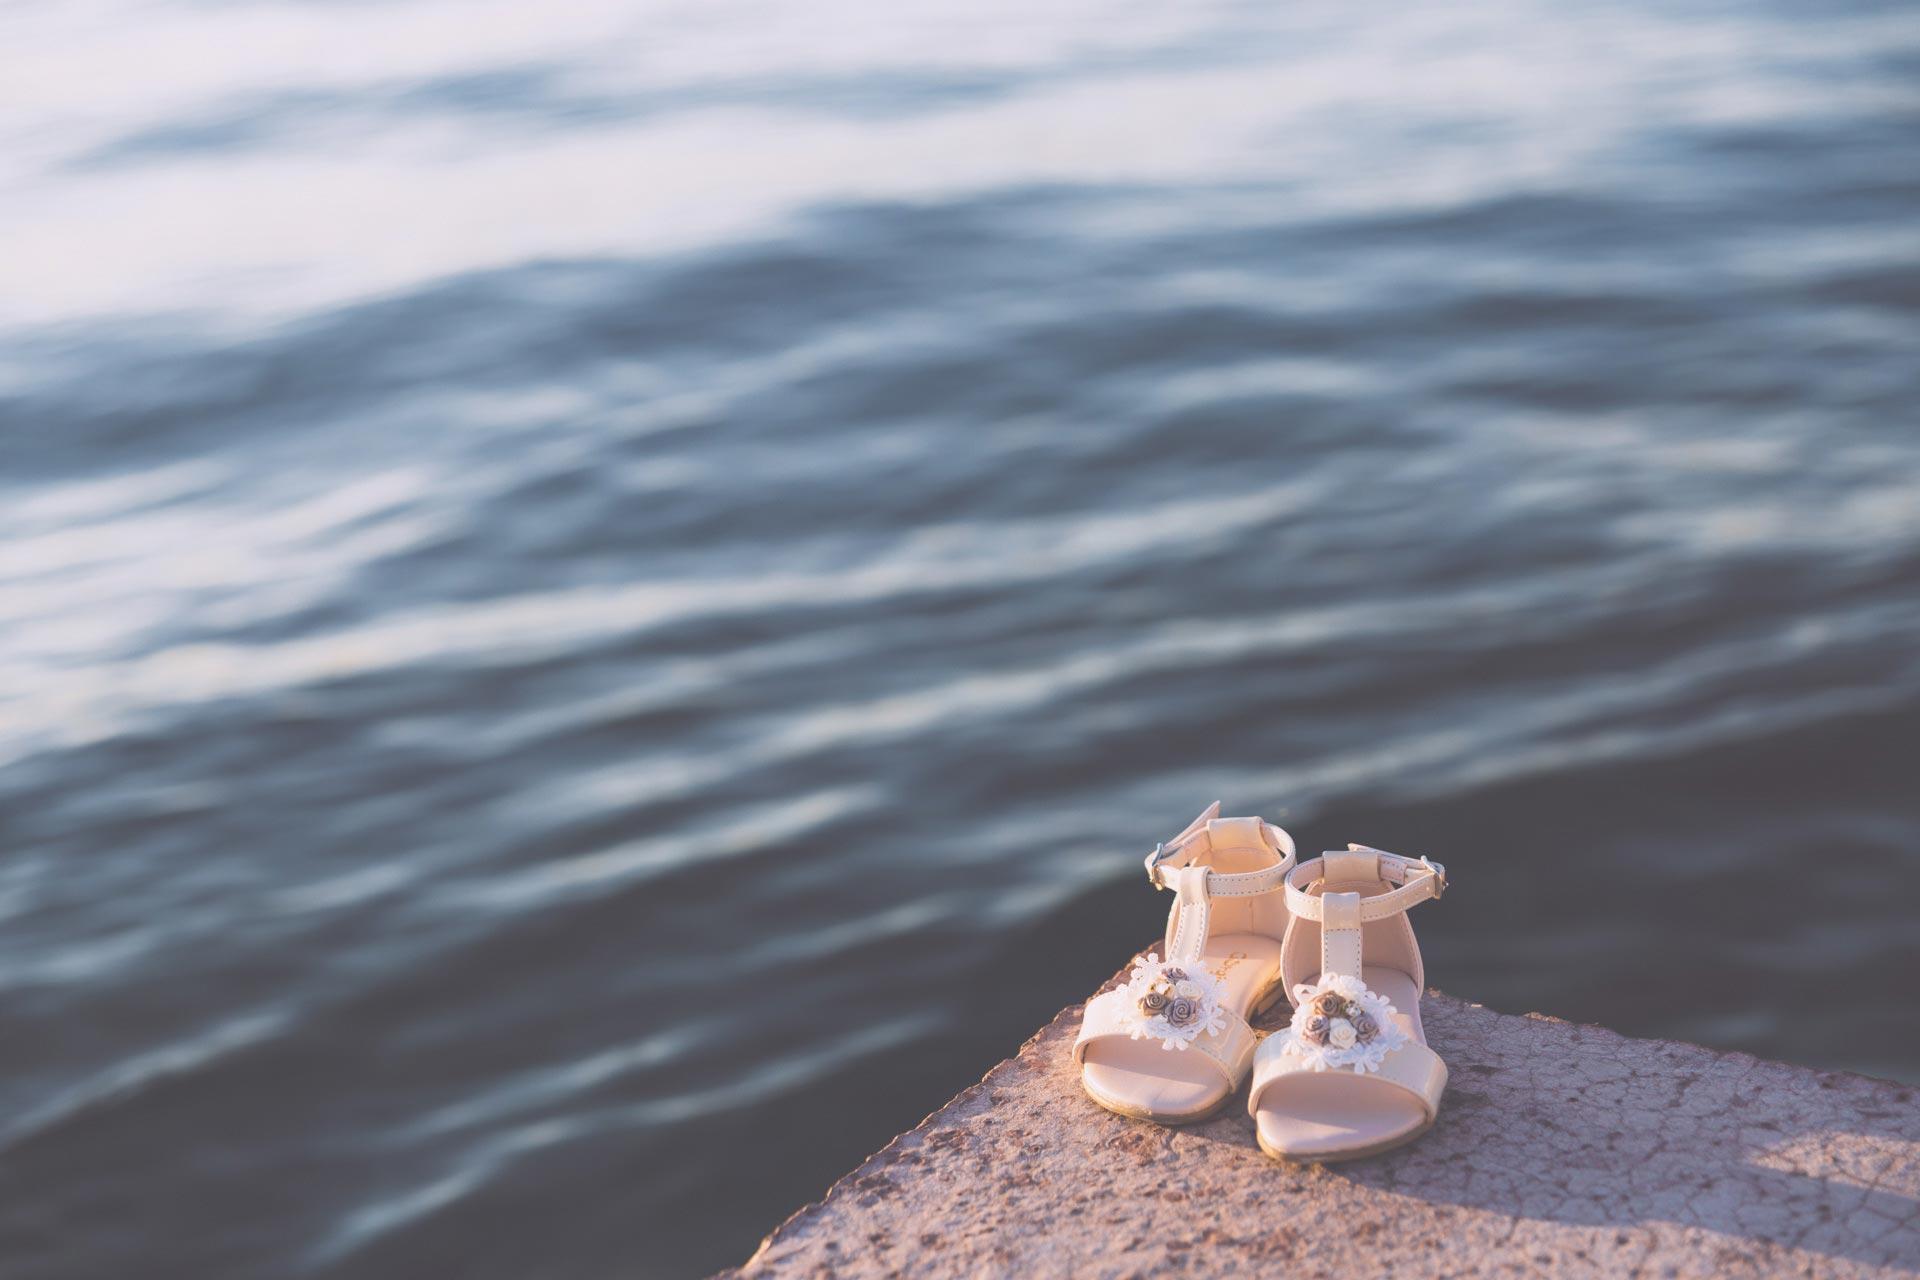 054 PhotoVaptisis Spetses vaptisi βαπτιση μωρο βαπτιστικά βαπριση σπετσες αγιος μαμας διακοσμηση βάπτισης γονείς νονά